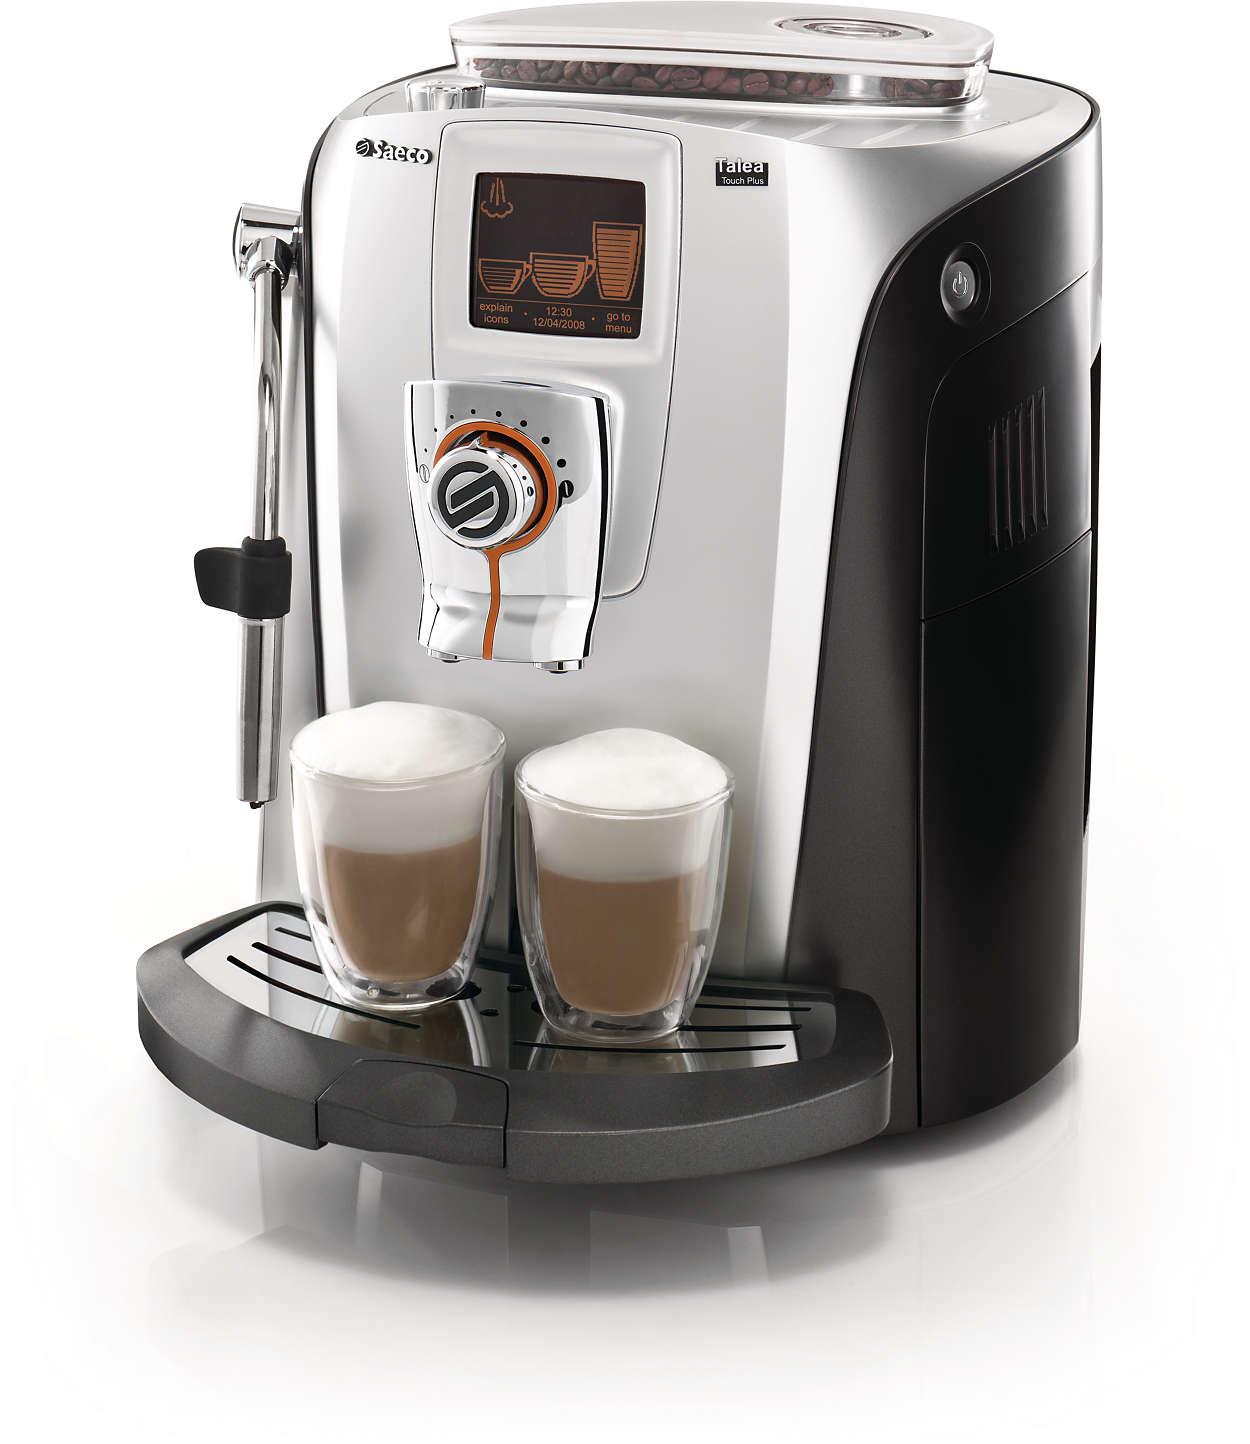 talea super machine espresso automatique ri9828 47 saeco. Black Bedroom Furniture Sets. Home Design Ideas